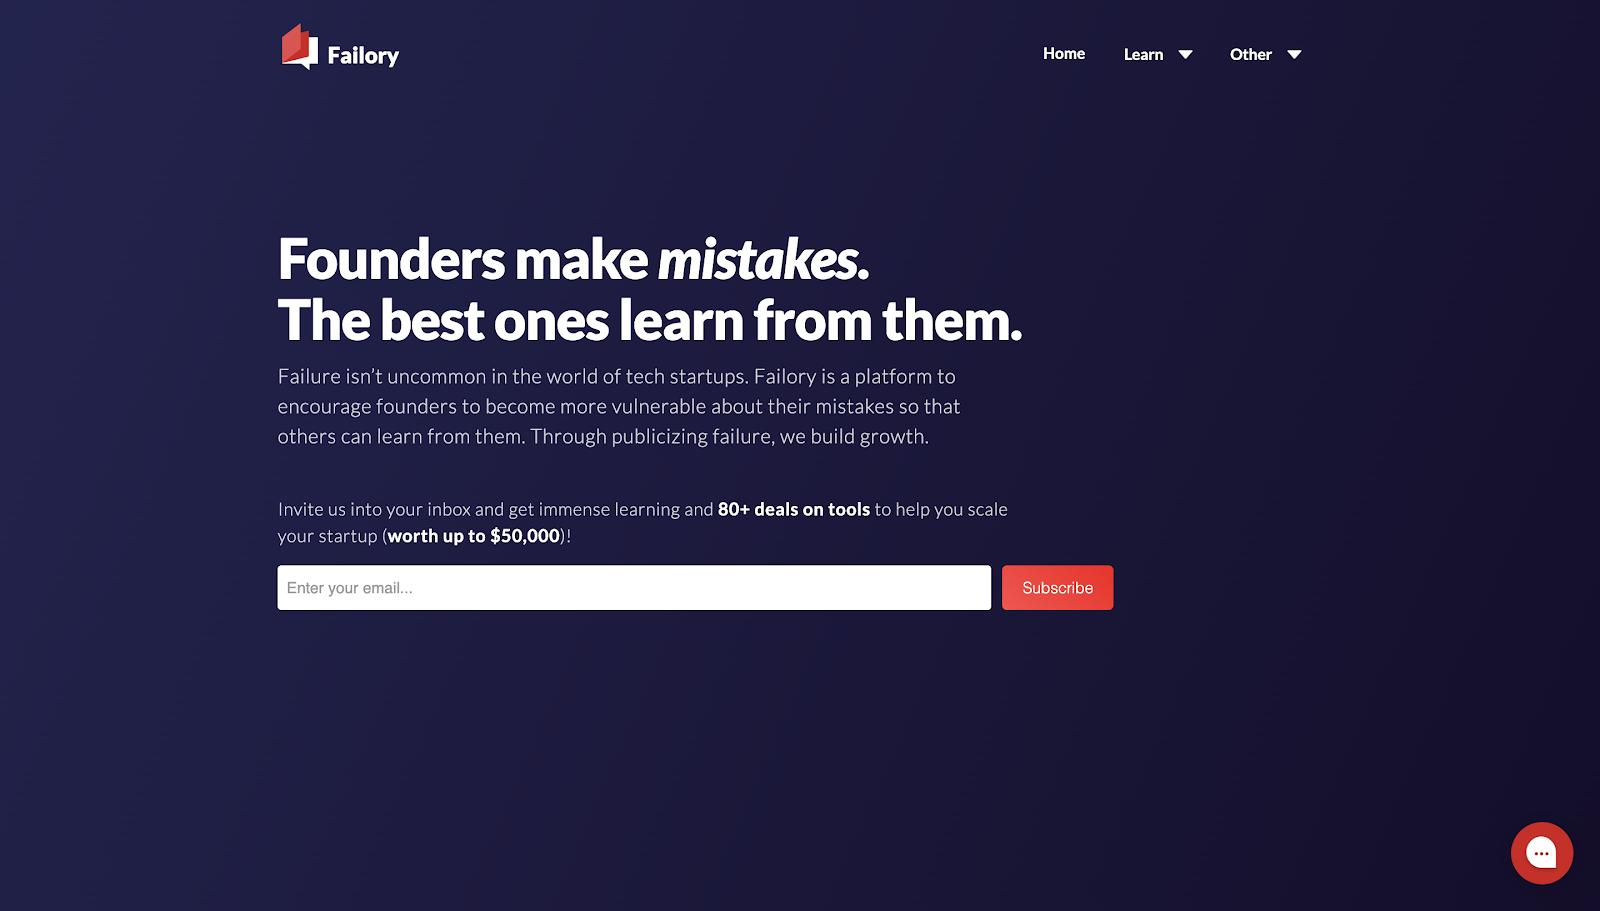 Failory's old website